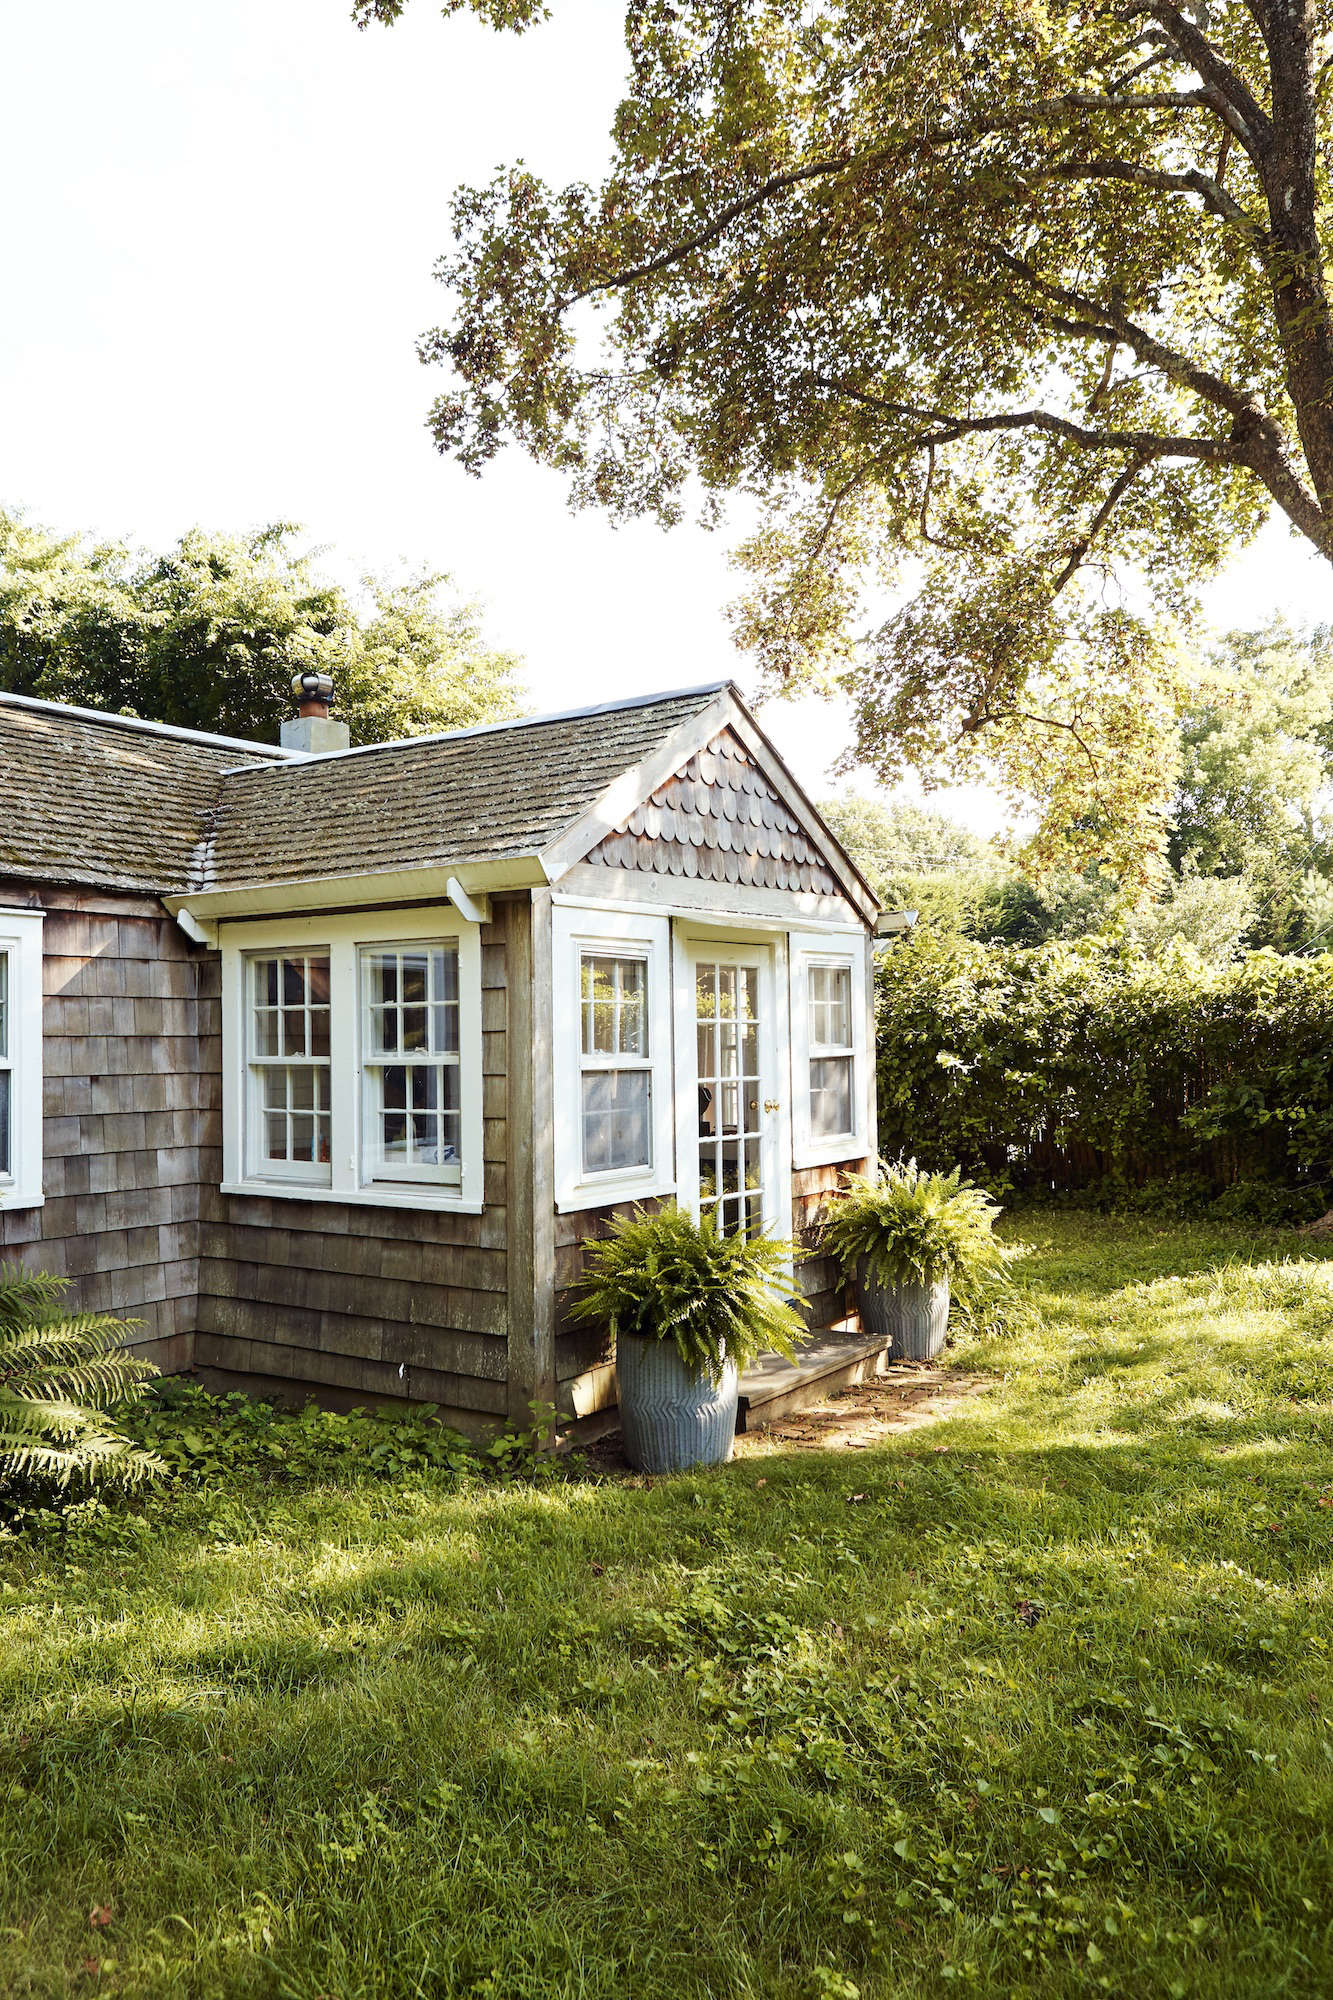 Living in 600 Square Feet: Designer Glenn Ban's Refined East Hamptons Cottage - Remodelista